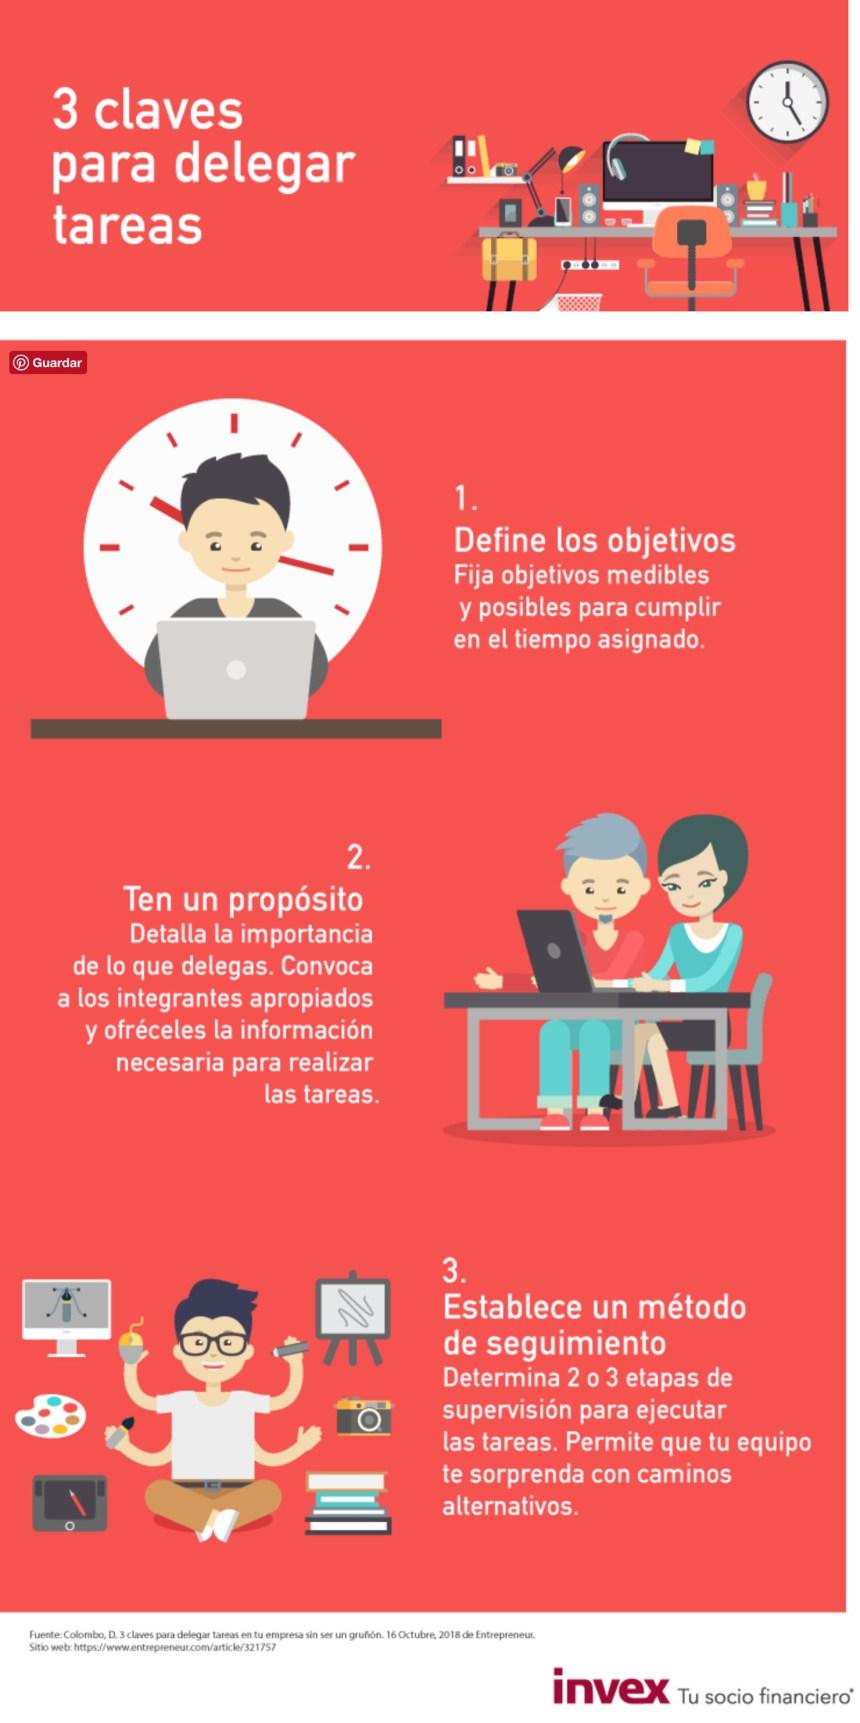 3 claves para delegar tareas #infografia #infographic #rrhh